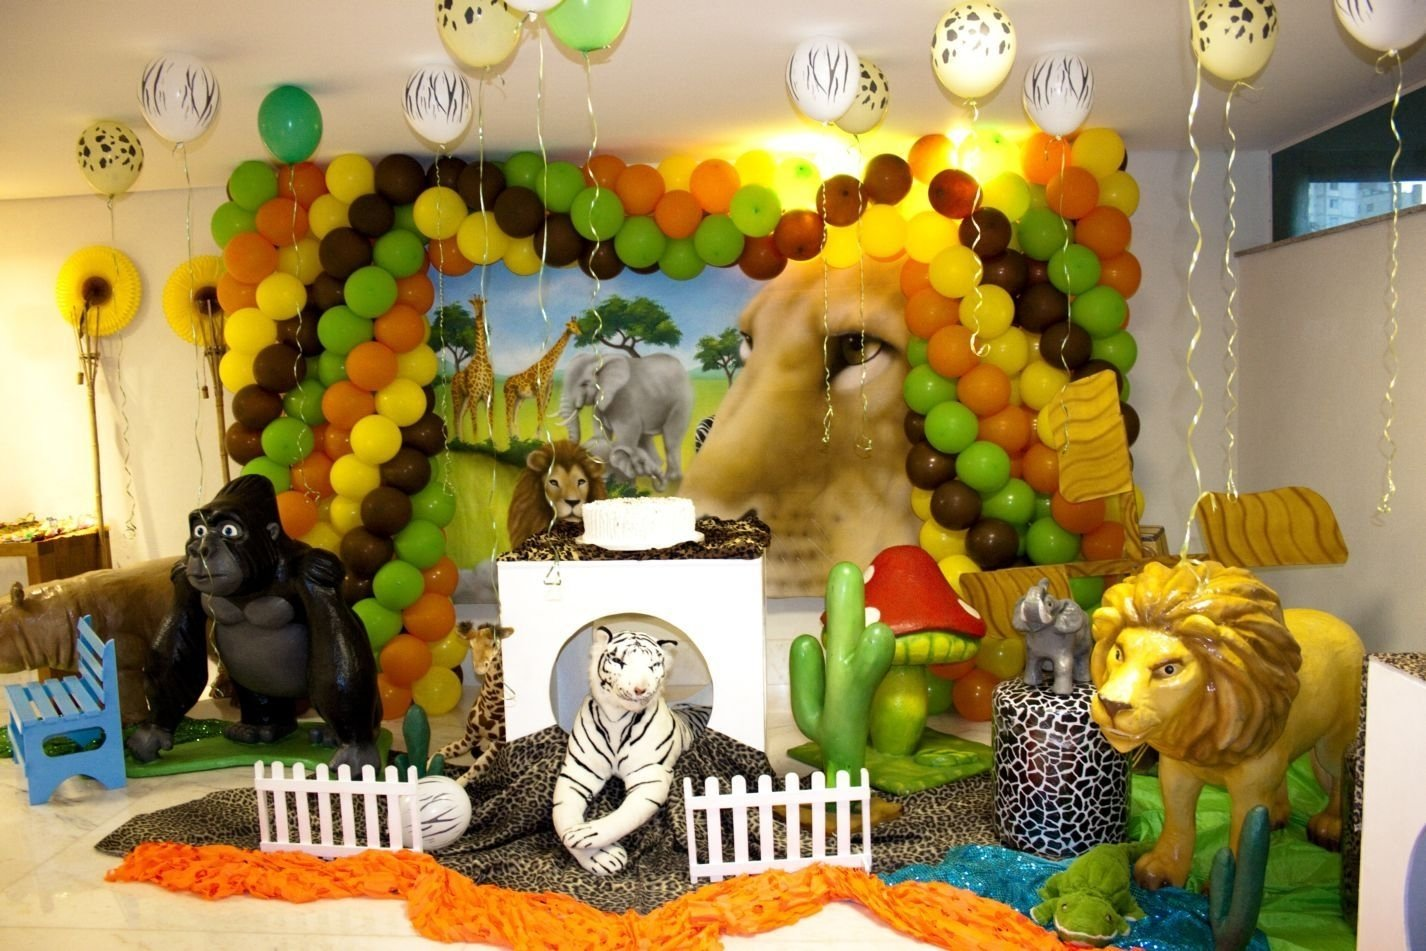 10 Spectacular Animal Themed Birthday Party Ideas animal props at jungle theme party jungle theme party pinterest 2020